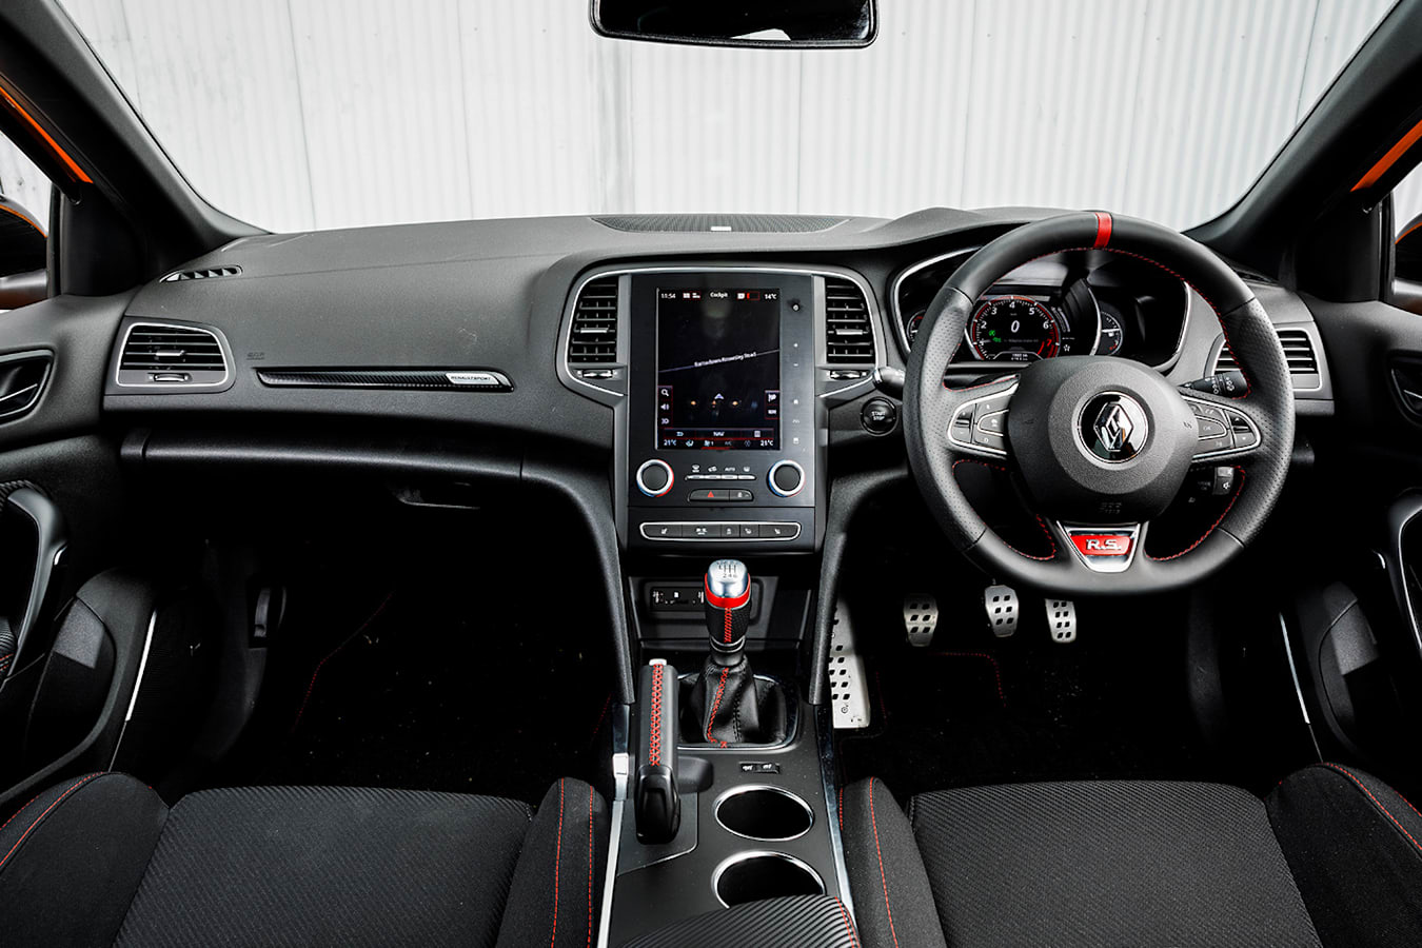 Renault Megane Rs Interior Jpg